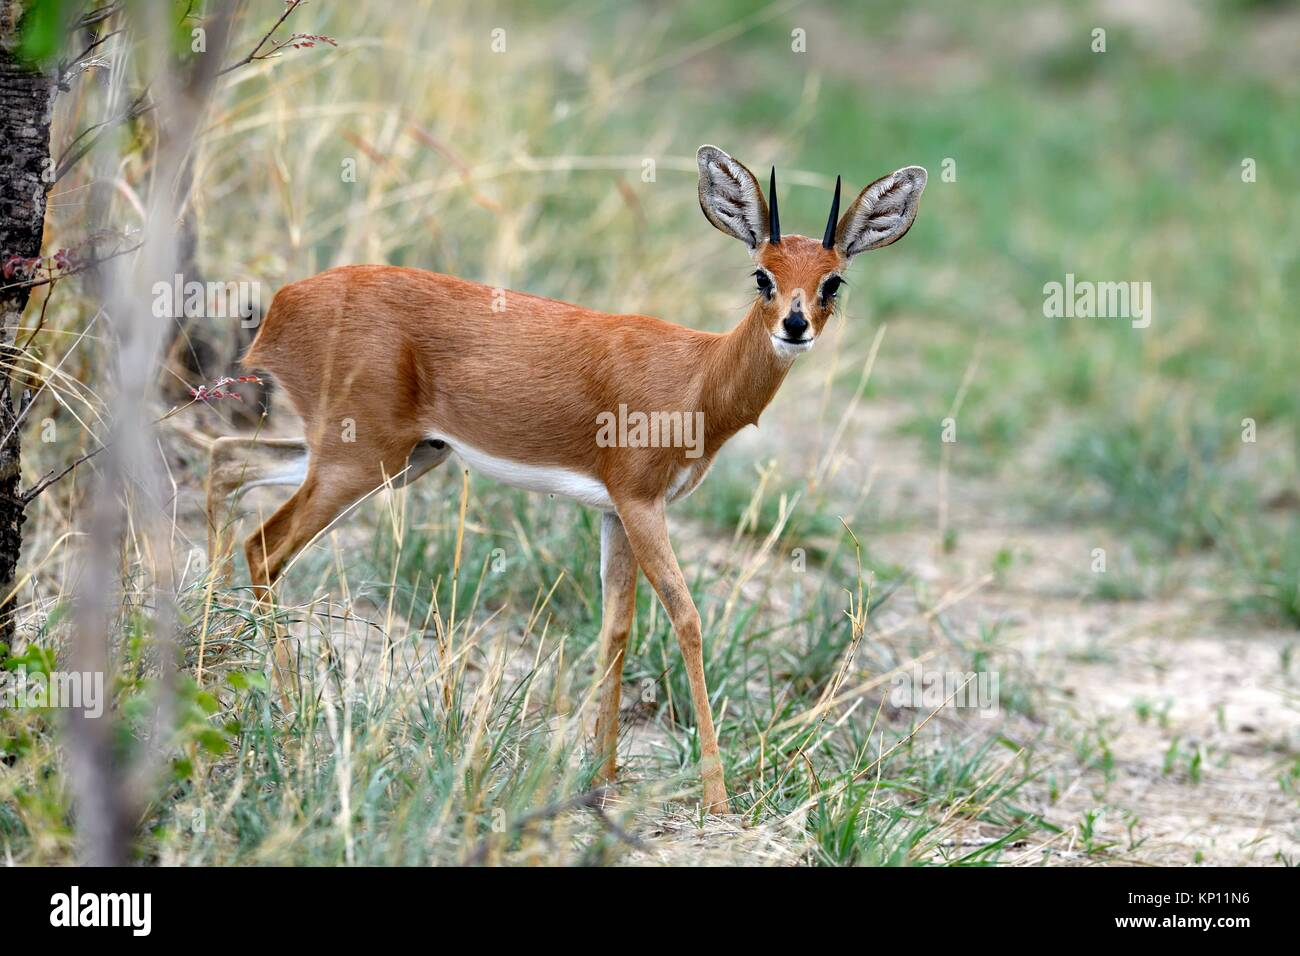 Macho Steenbok (Raphicerus campestris) El Parque Nacional de Hwange (Zimbabwe). Imagen De Stock